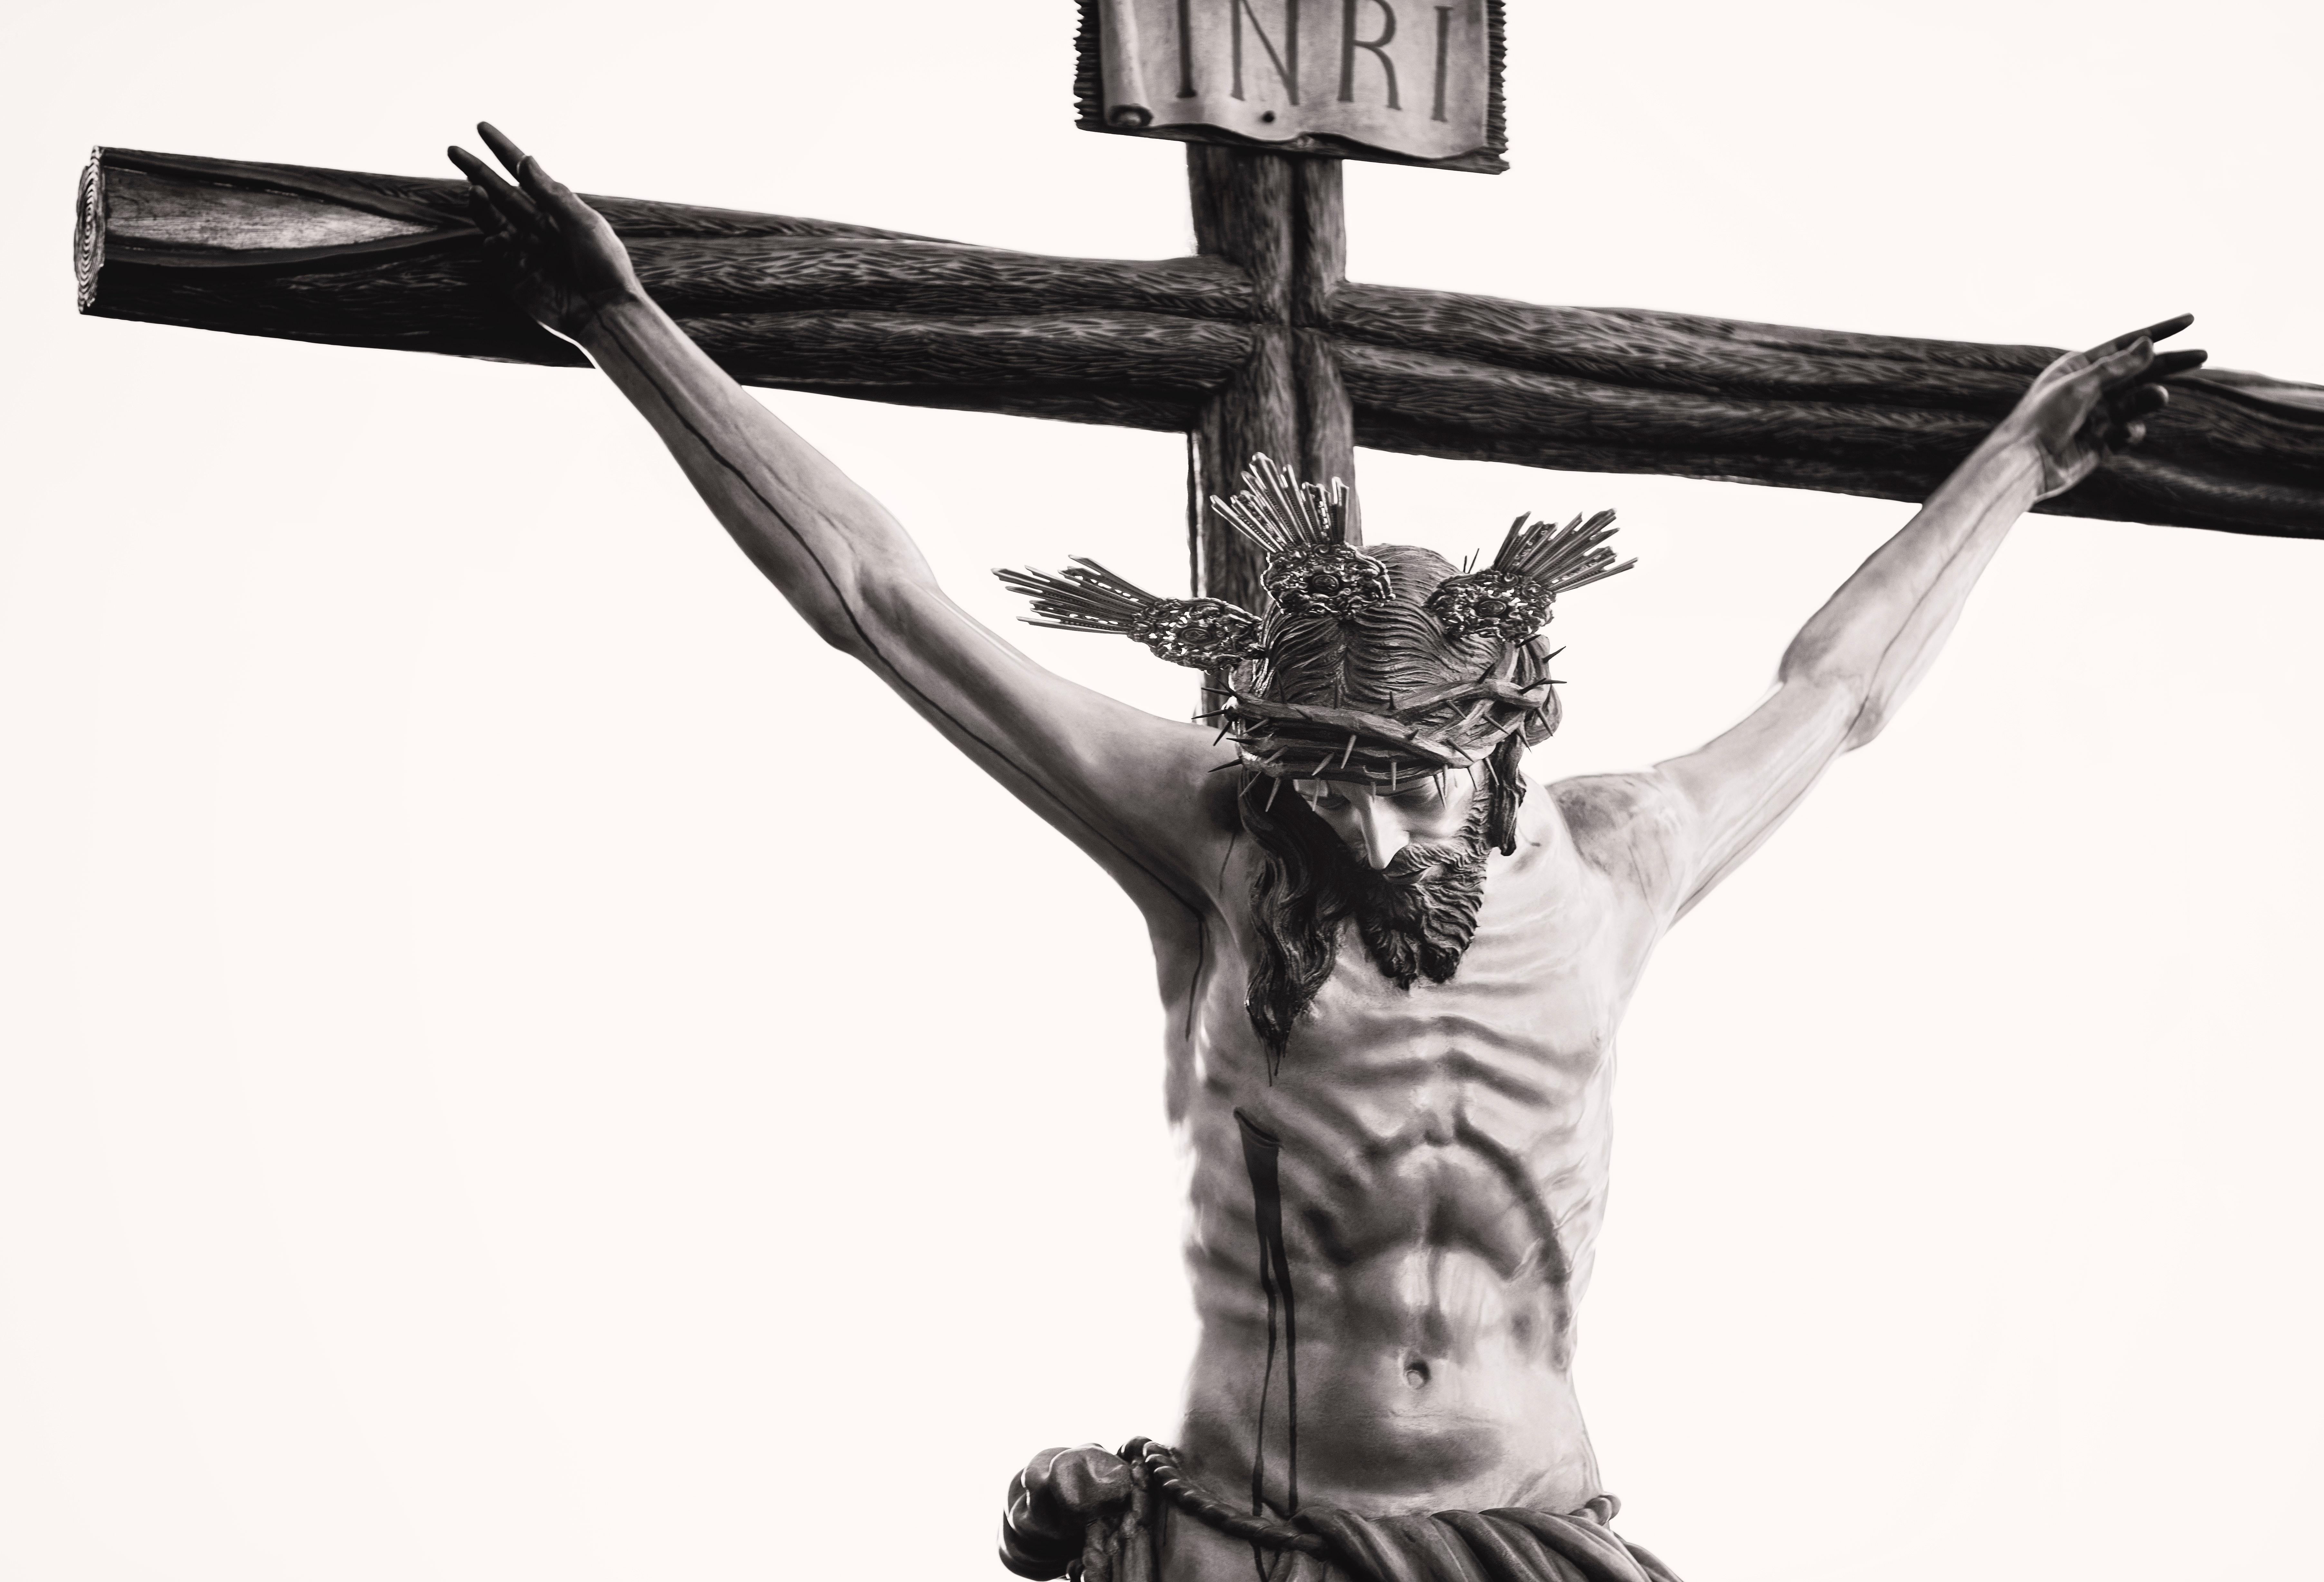 Christ's Cross